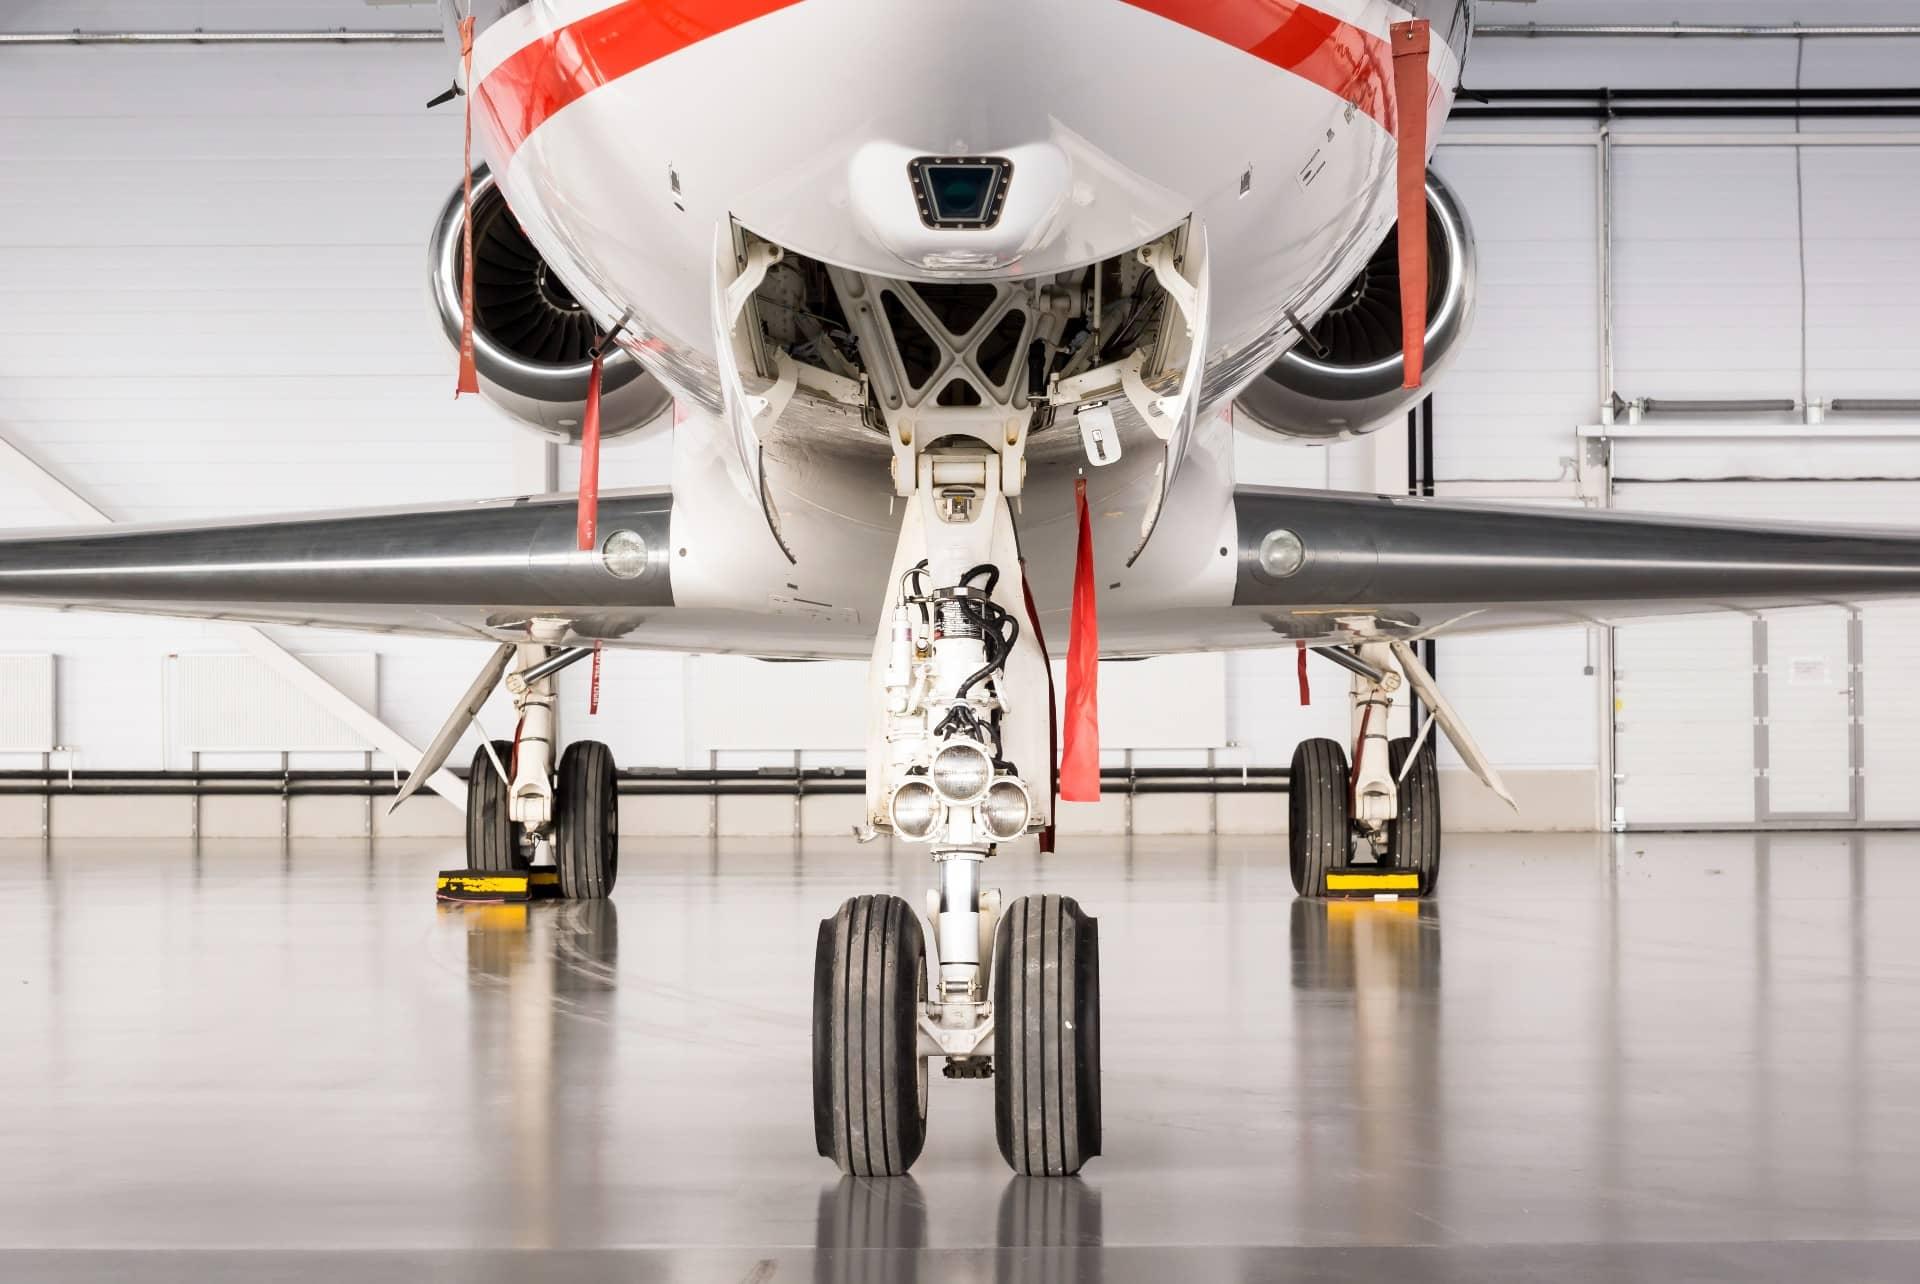 A plane parked inside a garage